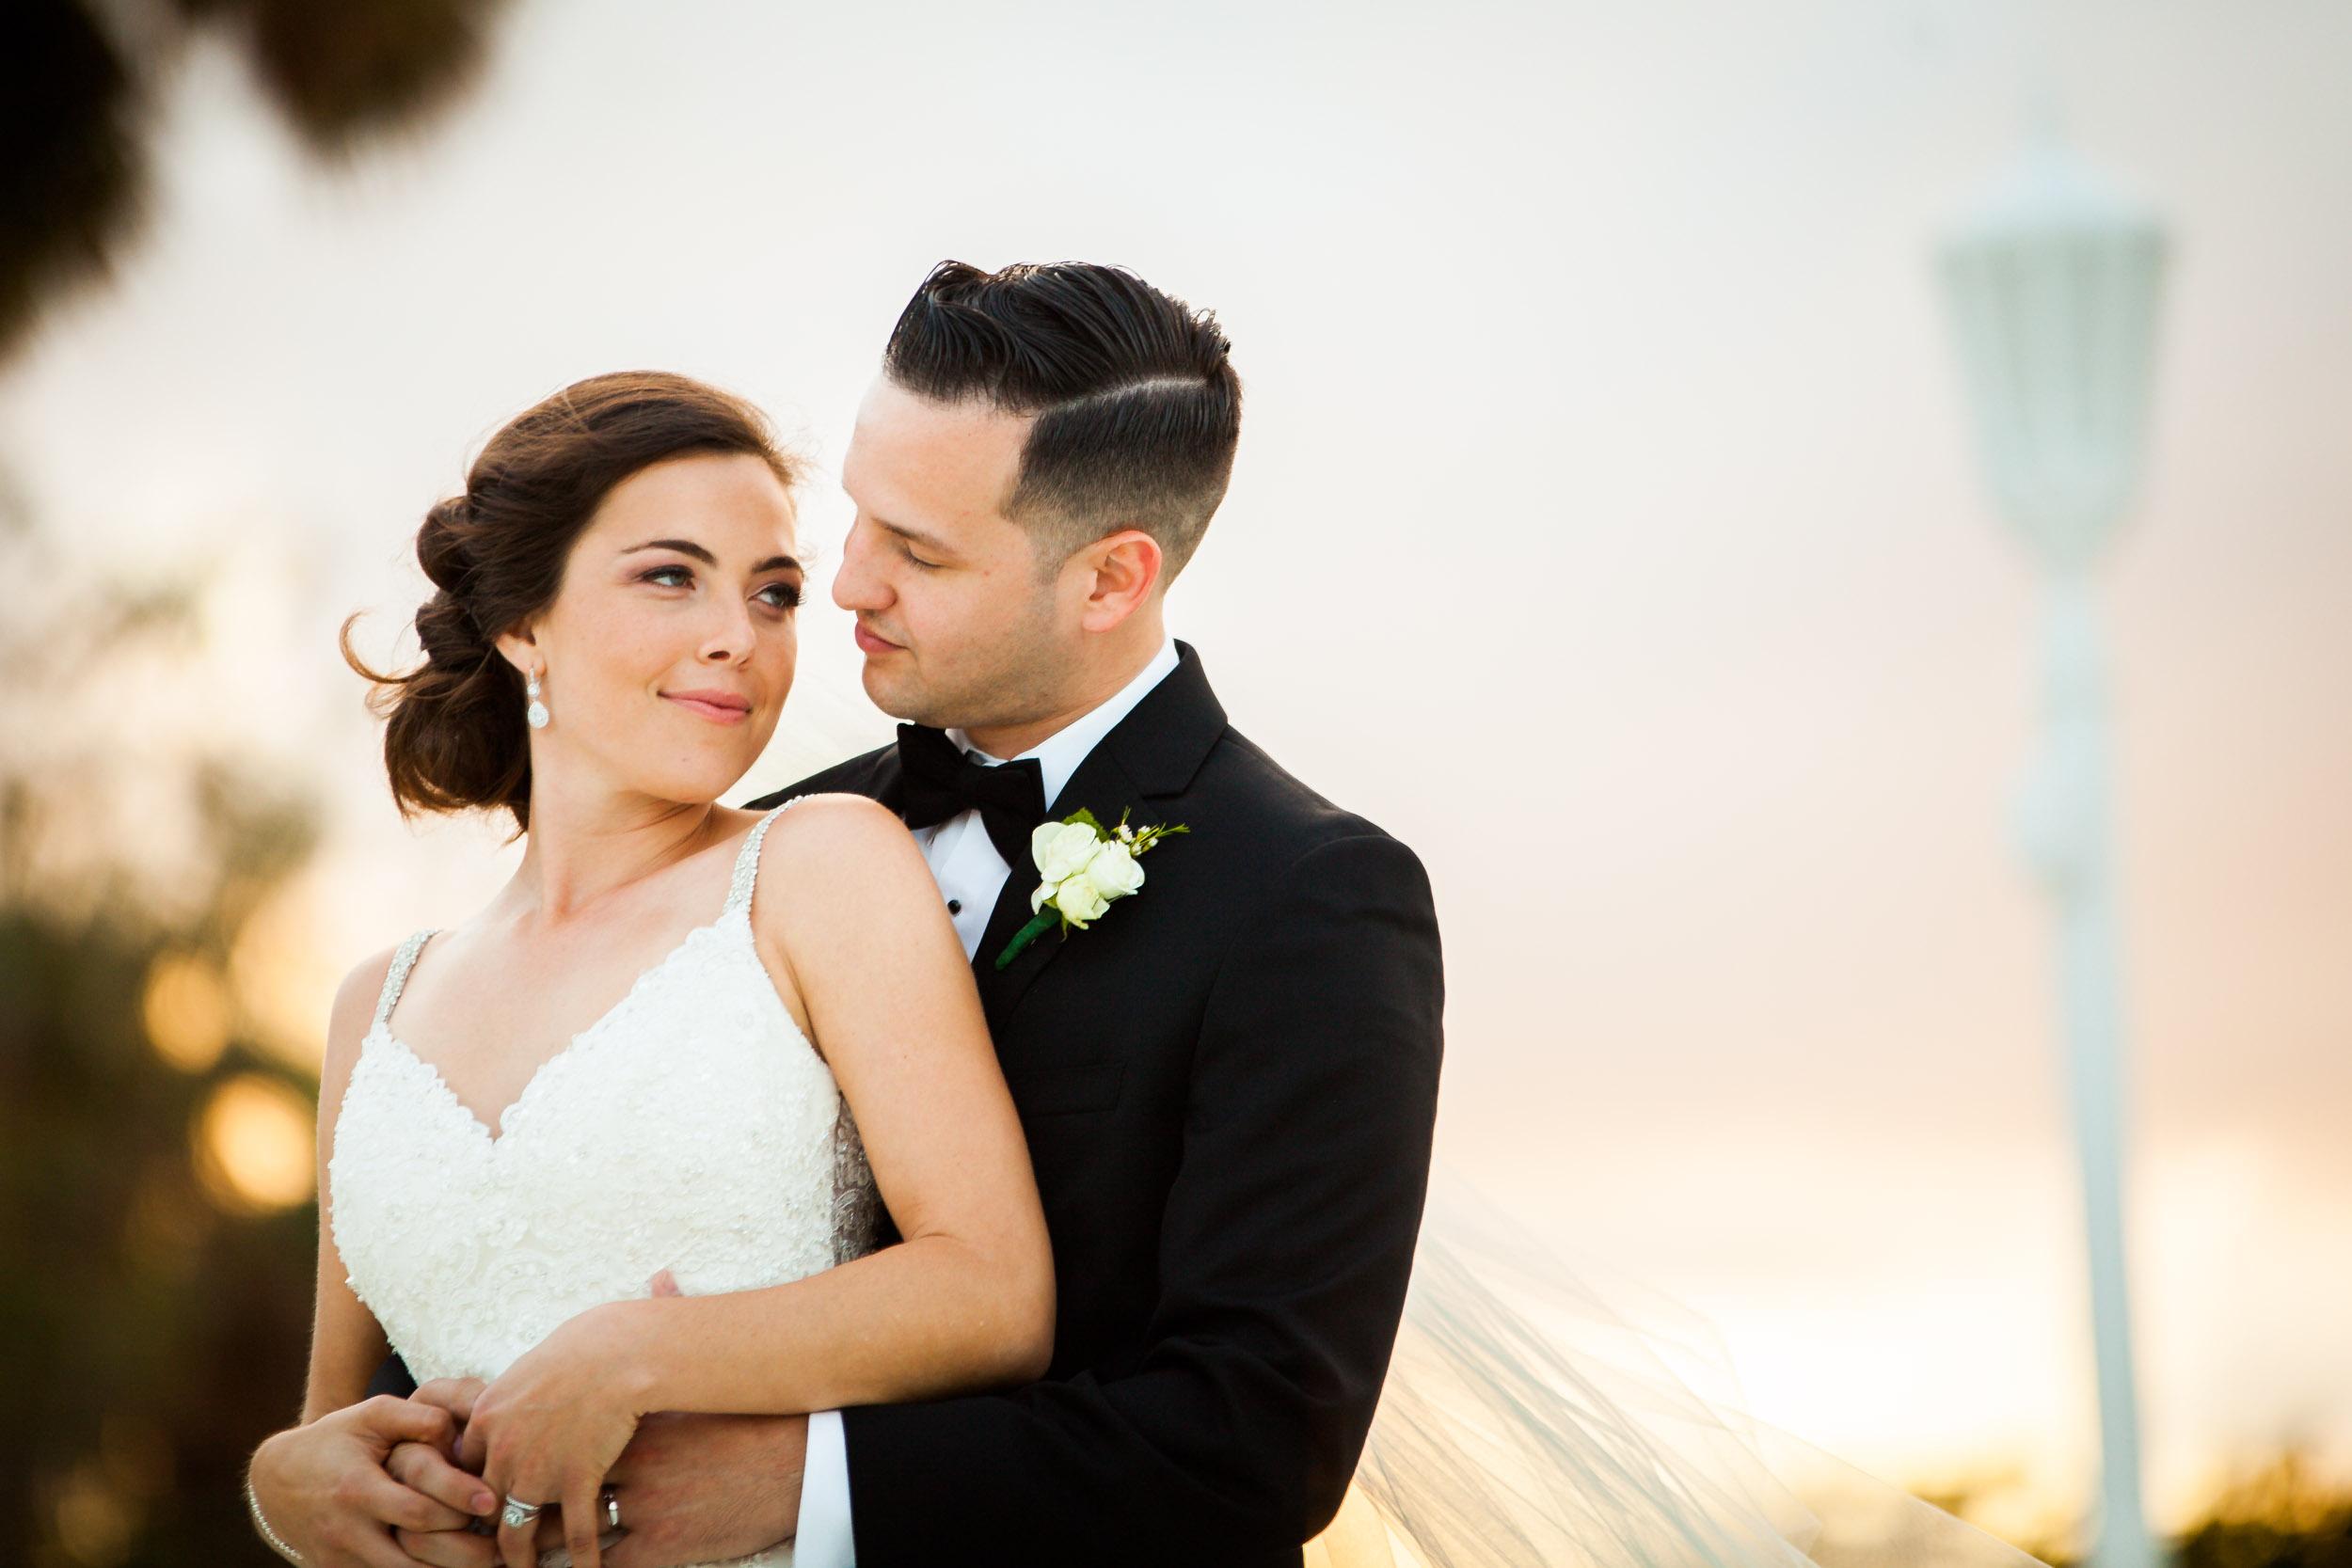 Flordia-Wedding-Photography-49.jpg